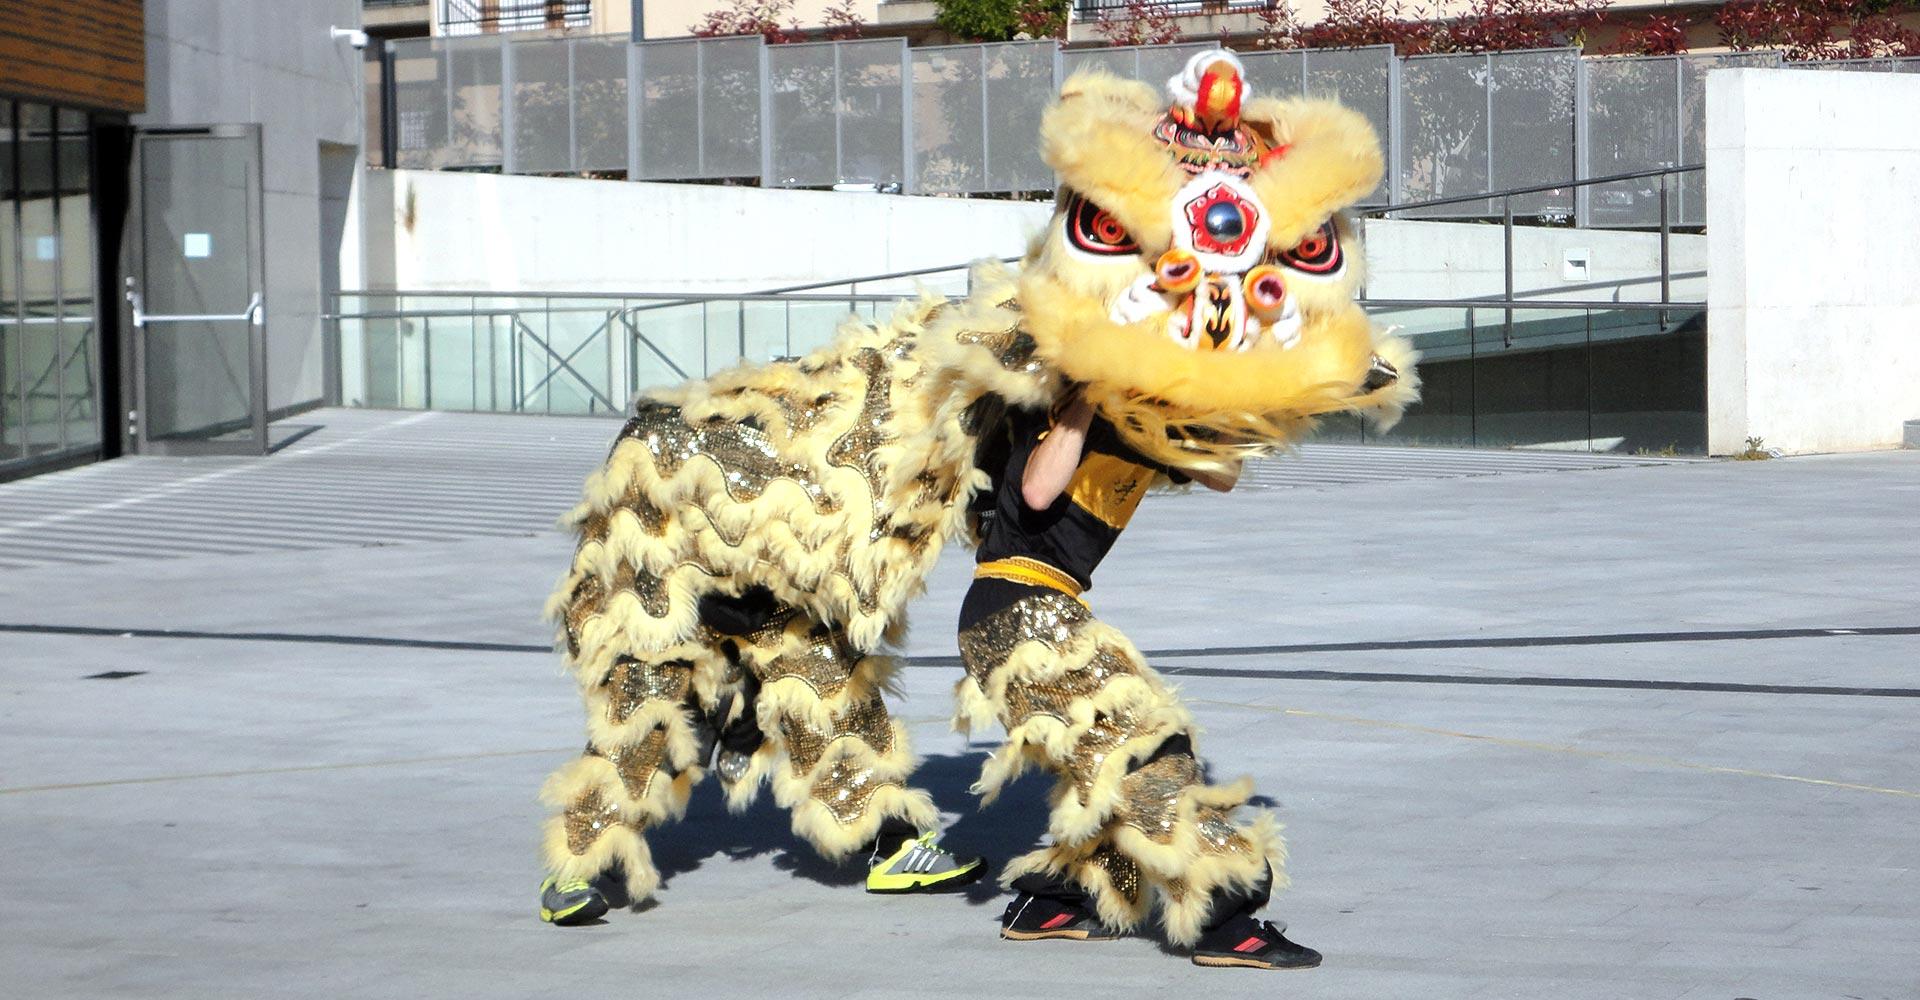 Danza del León - Otro momento durante la Danza